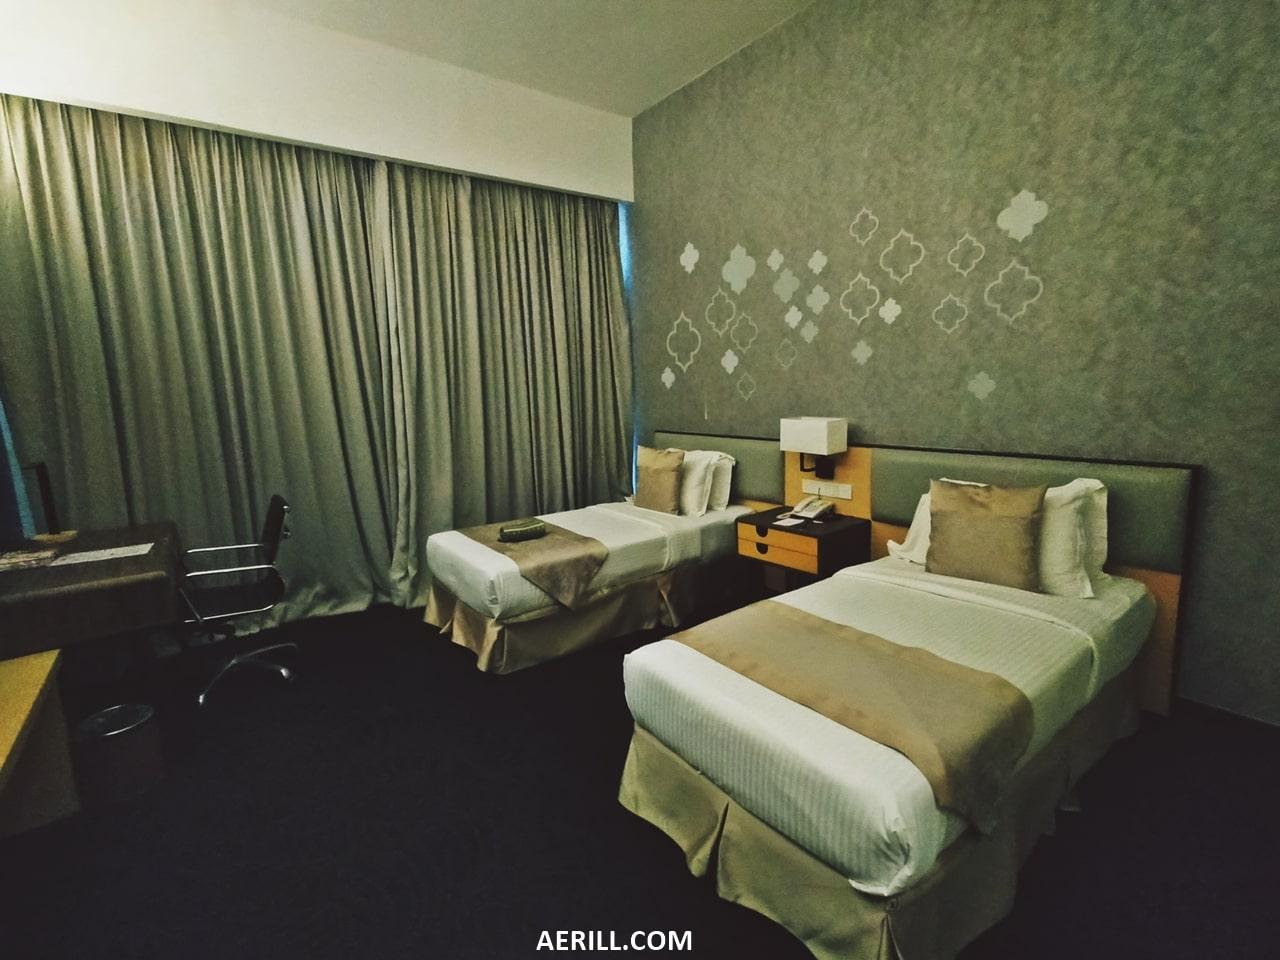 Review Pengalaman Menginap di Paya Bunga Hotel, Kuala Terengganu